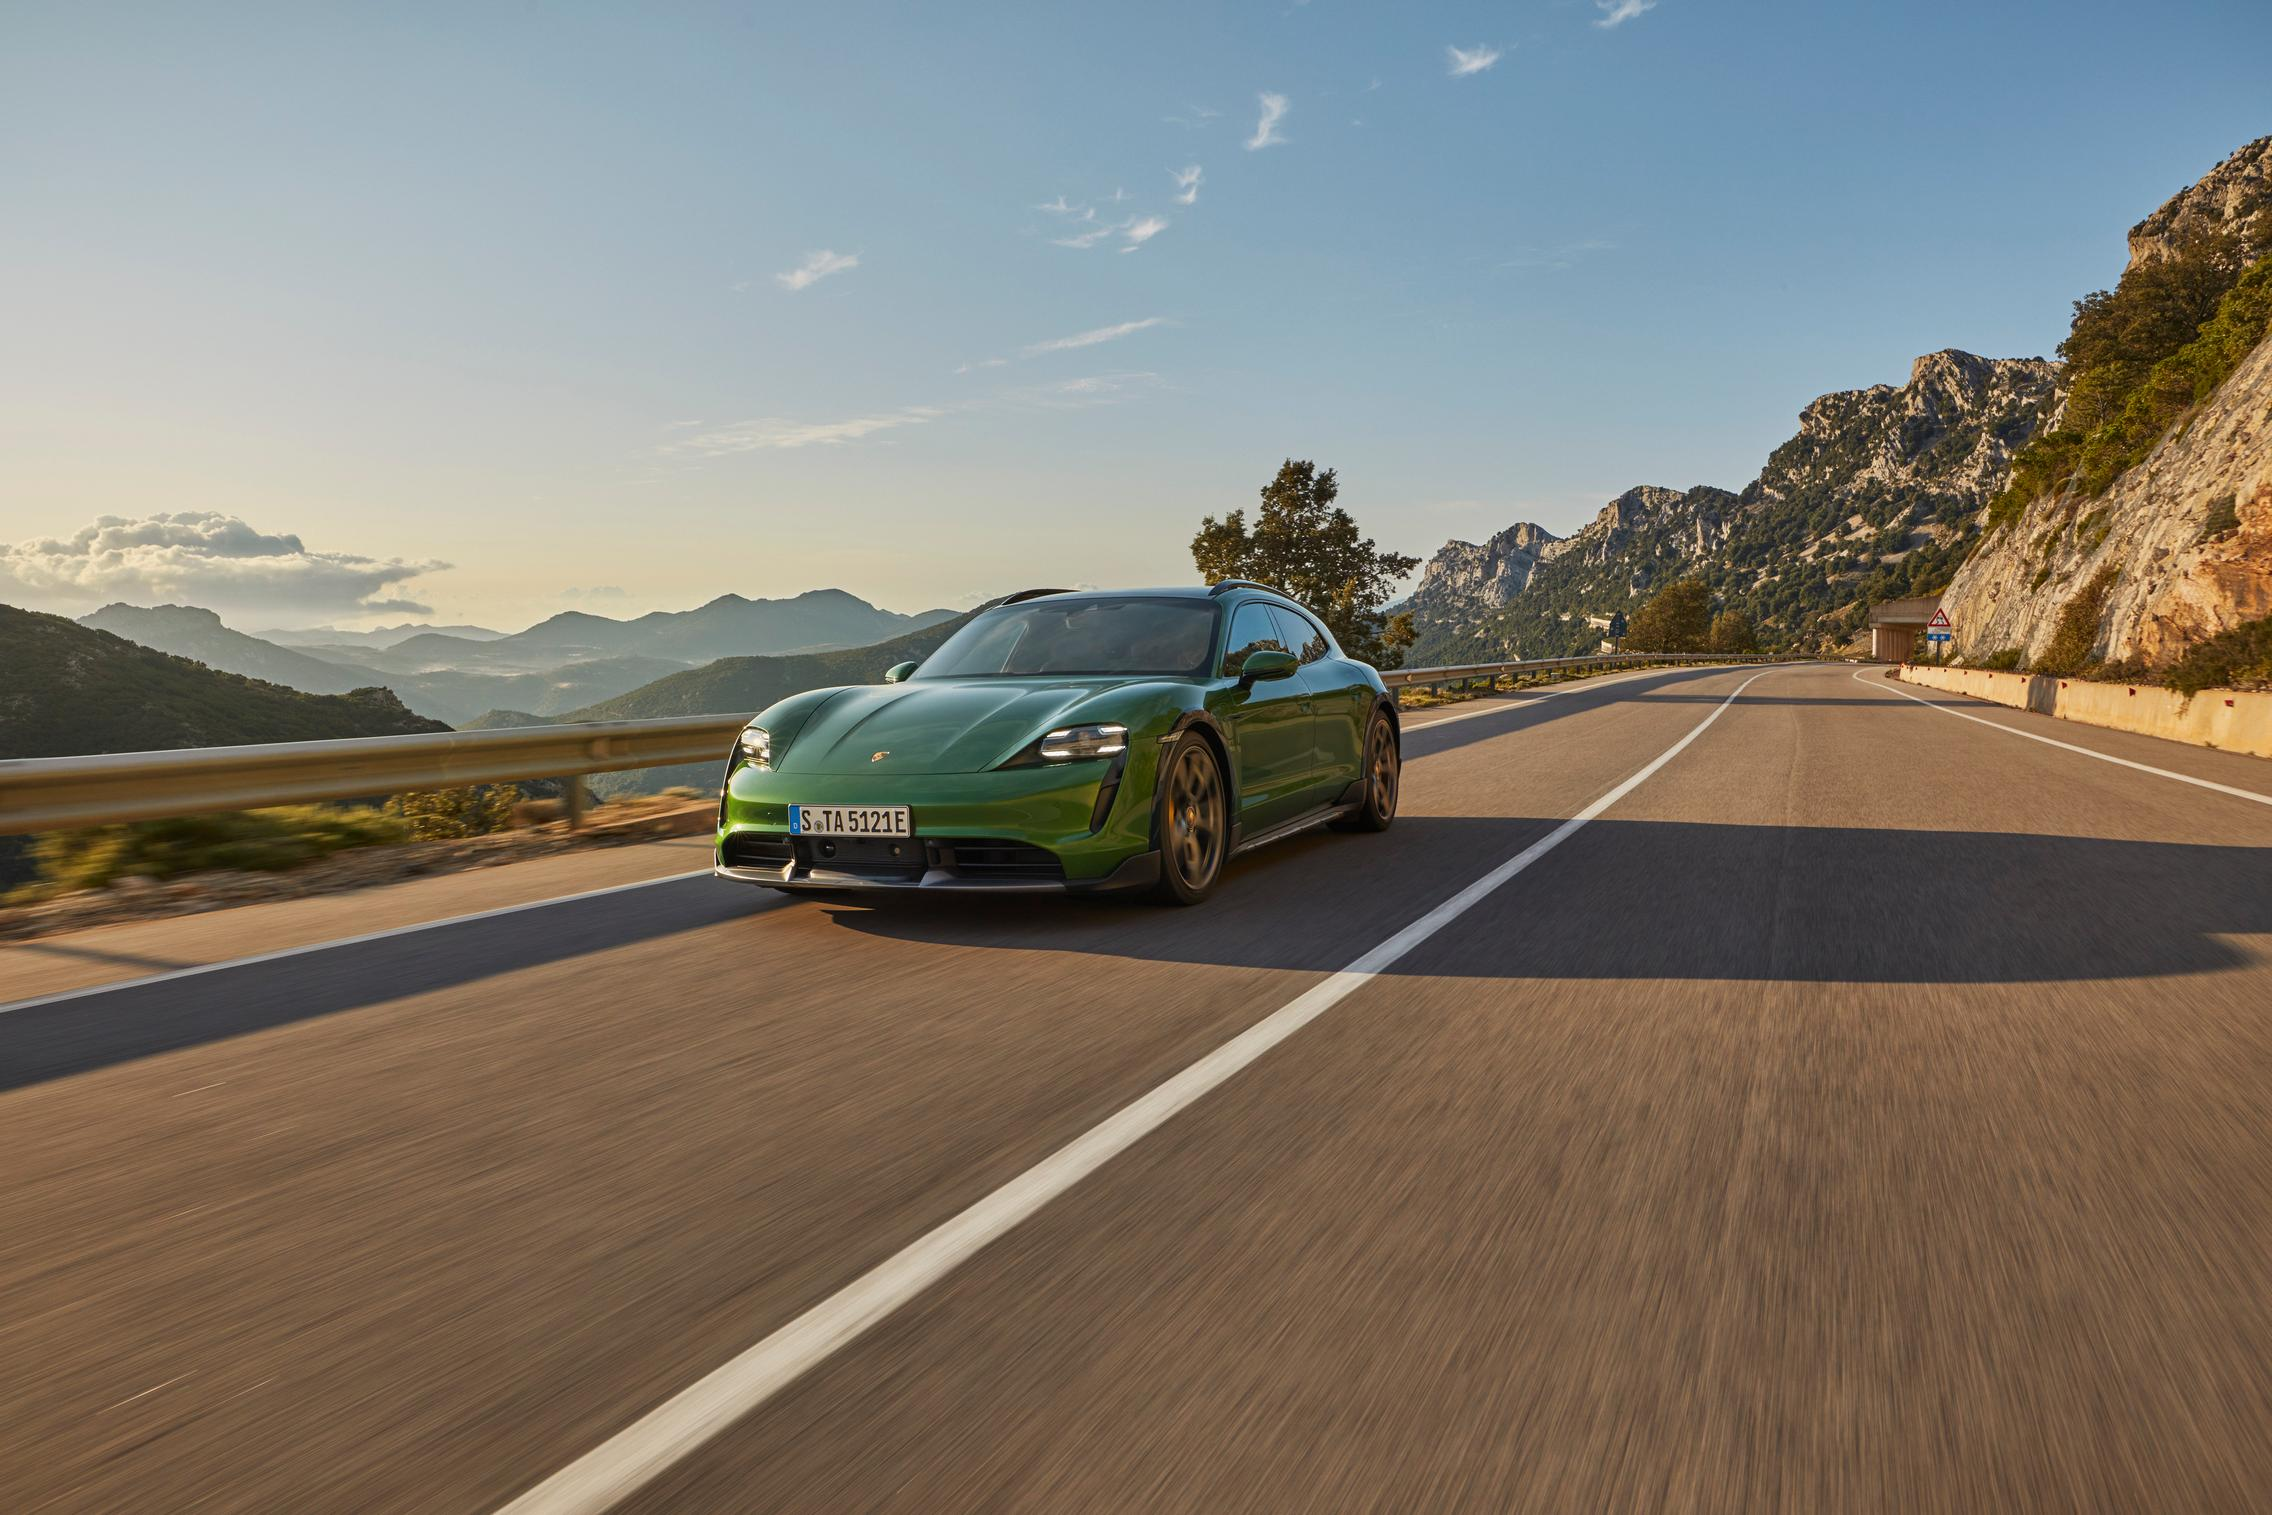 Porsche Taycan Cross Turismo green